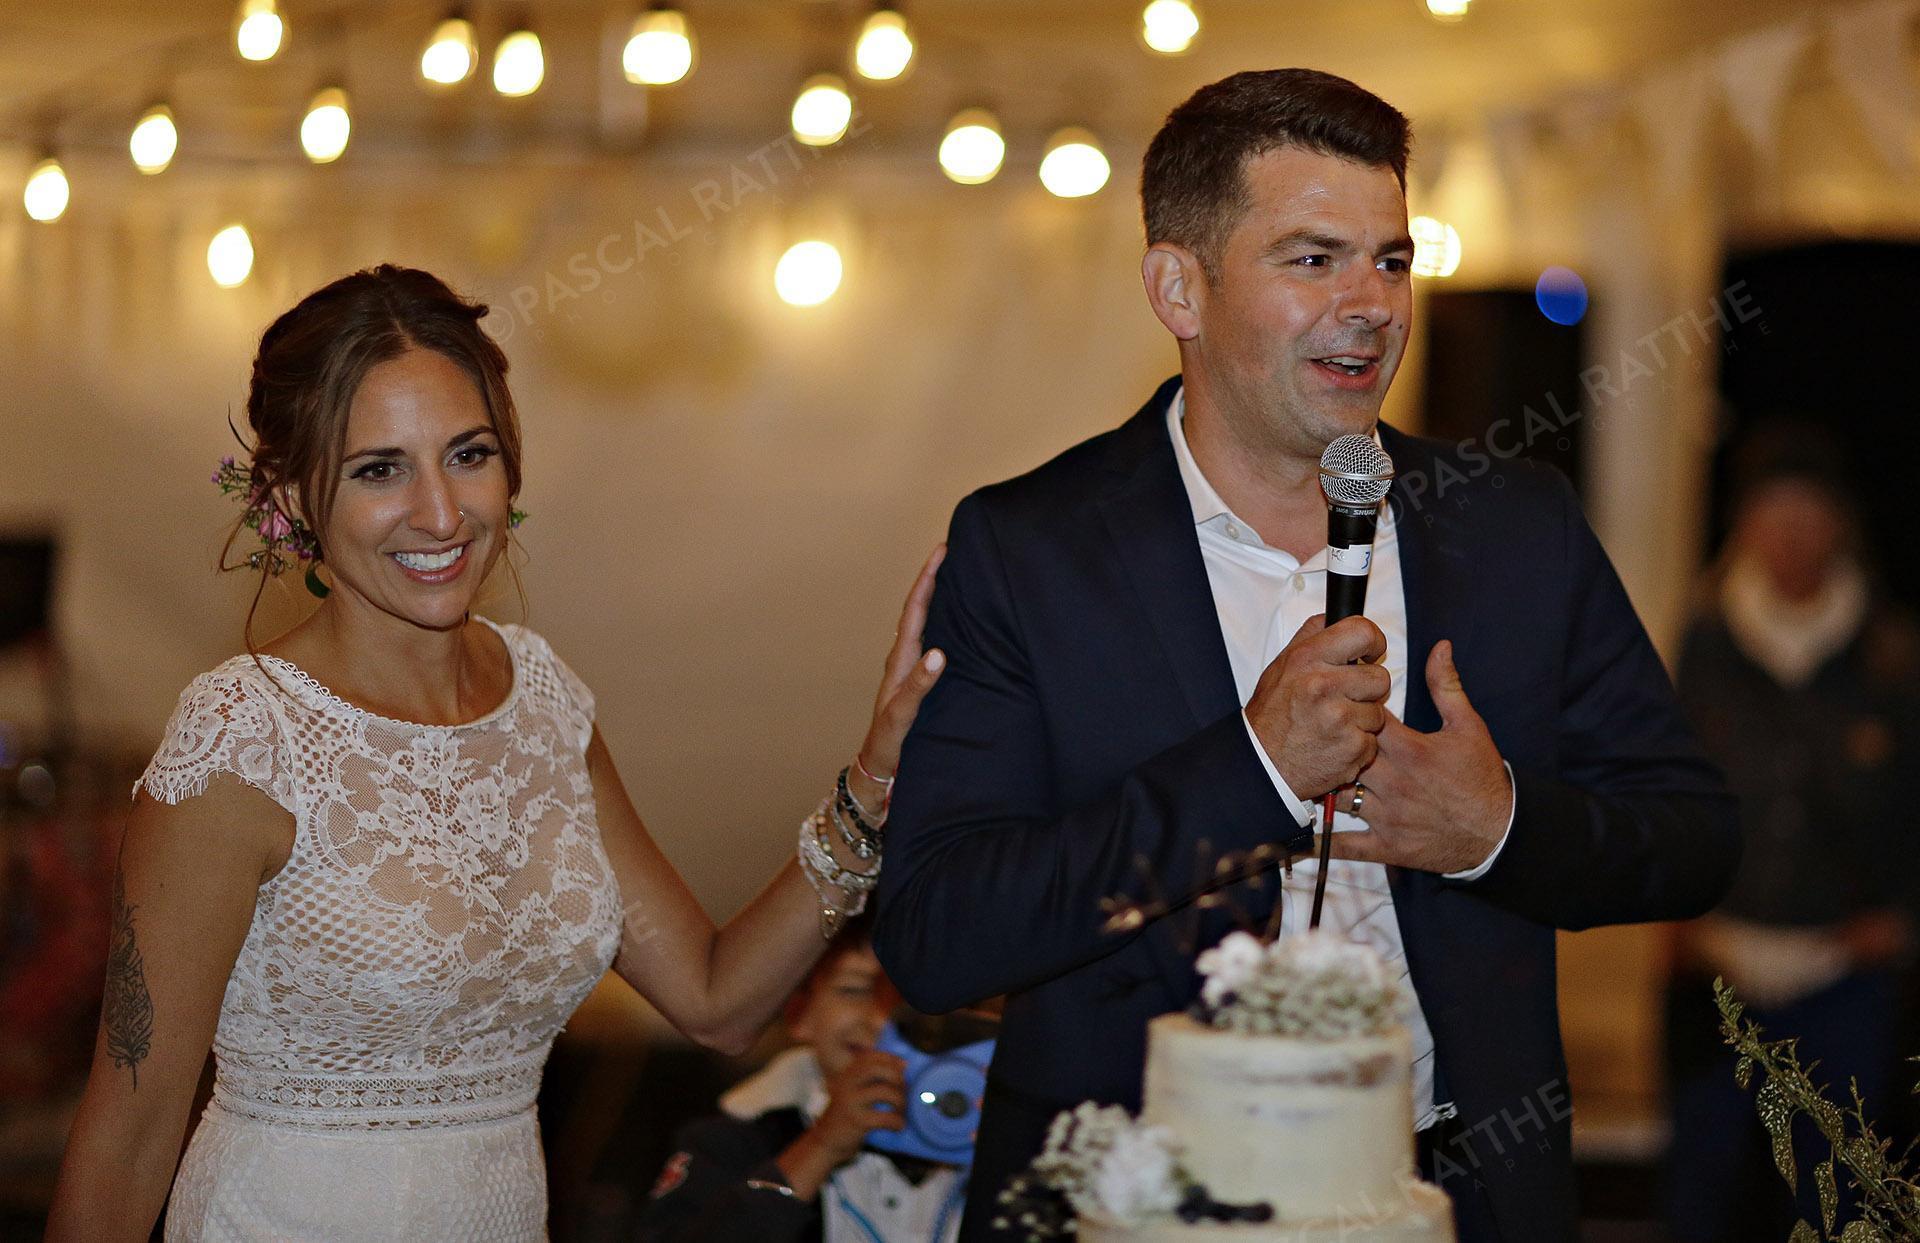 remerciement des mariés envers les invités, moment très émotif